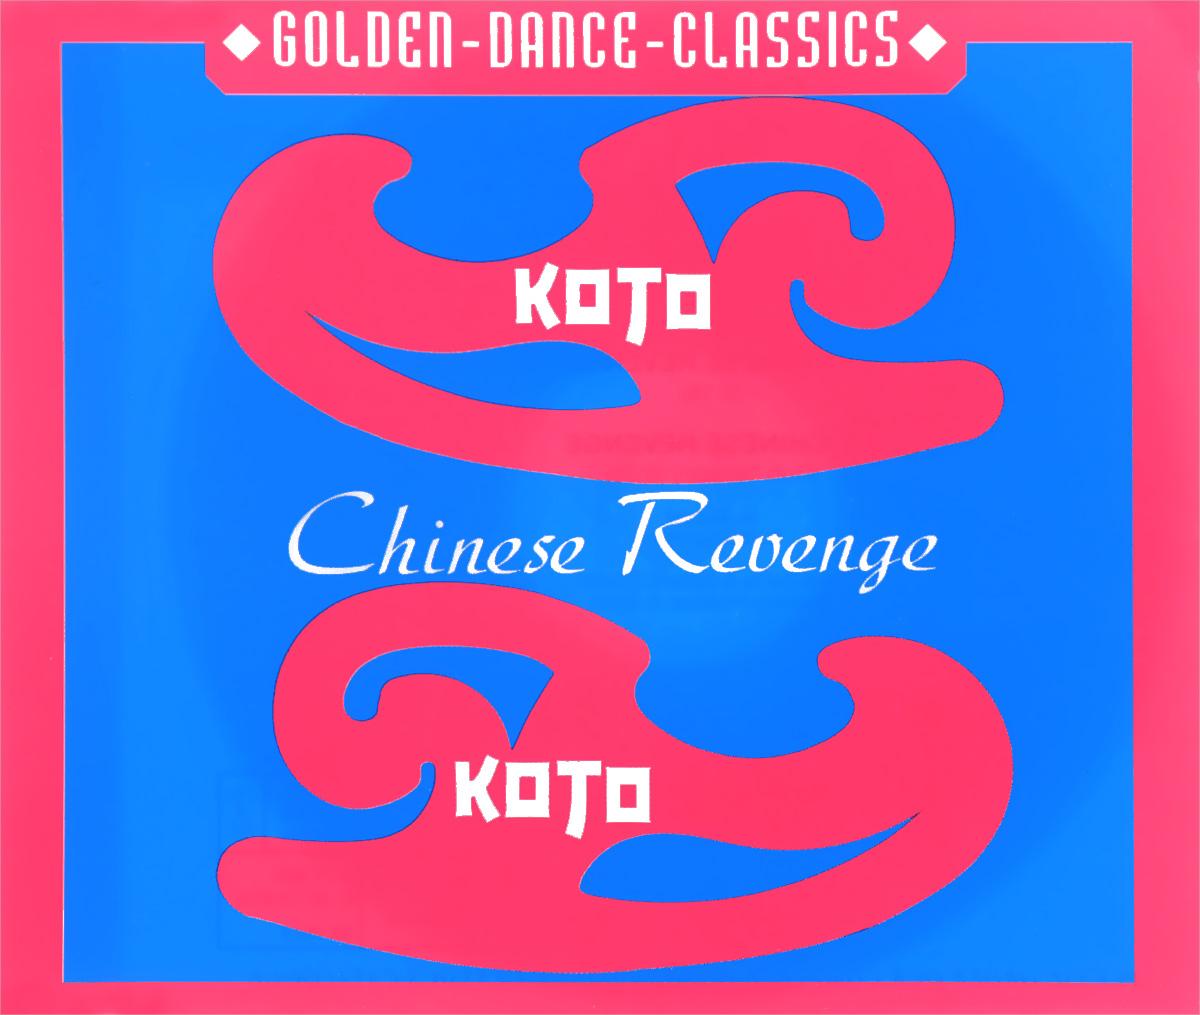 Koto Koto. Chinese Revenge скальп петуха veniard chinese cock cape